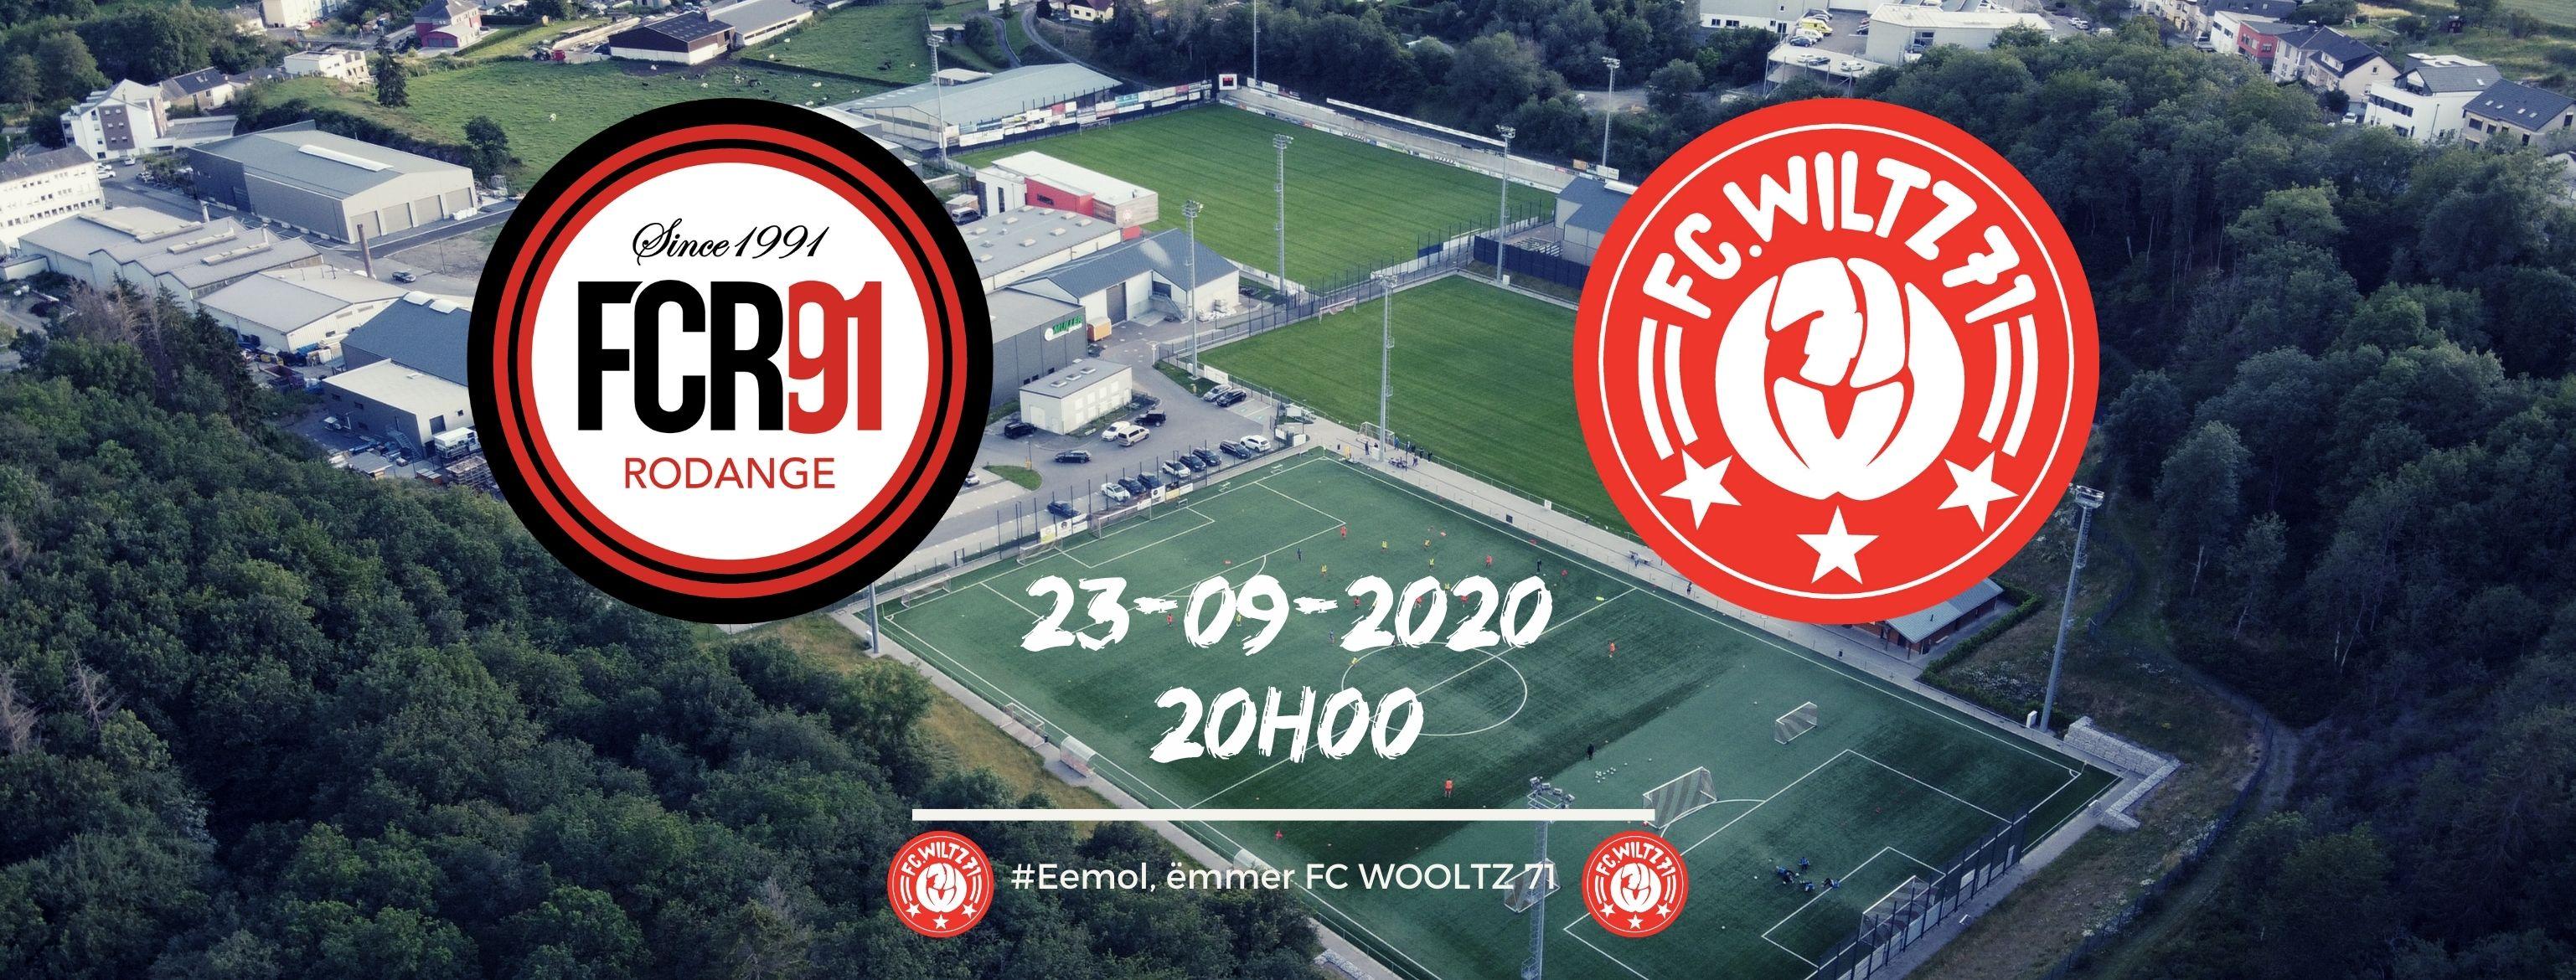 Matchday 5: FCR91 vs FC WILTZ 71